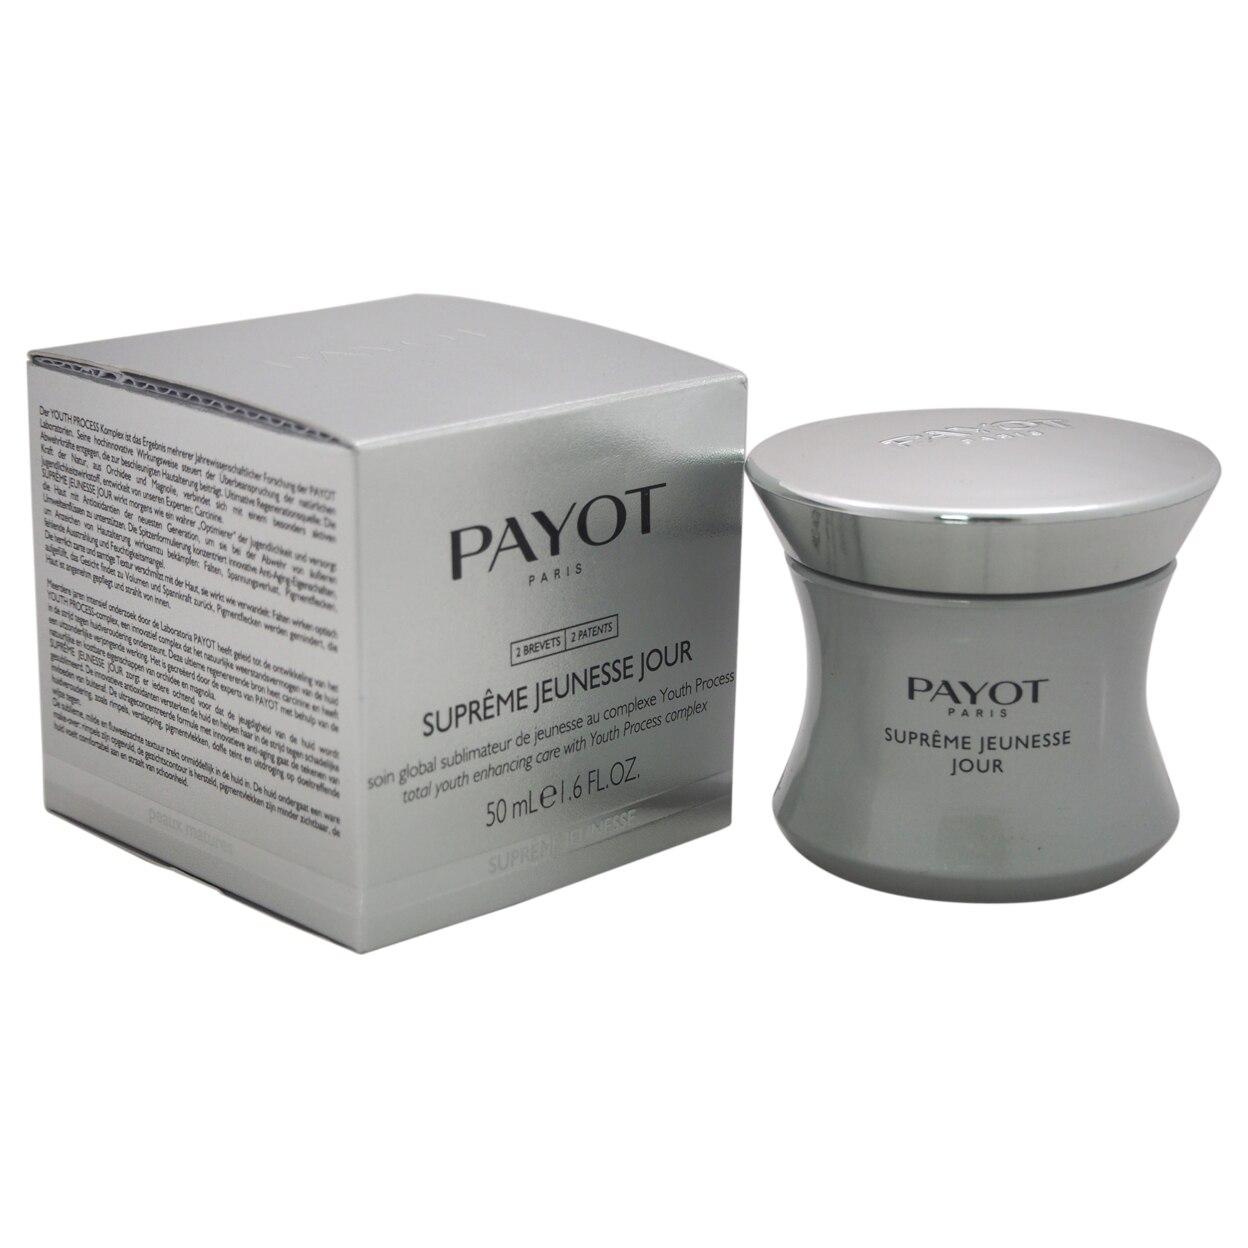 Supreme Jeunesse Jour Total Youth Enhancing Care by Payot for Women - 1.6 oz Cream phytomer крем ночной омолаживающий night recharge youth enhancing cream 50мл